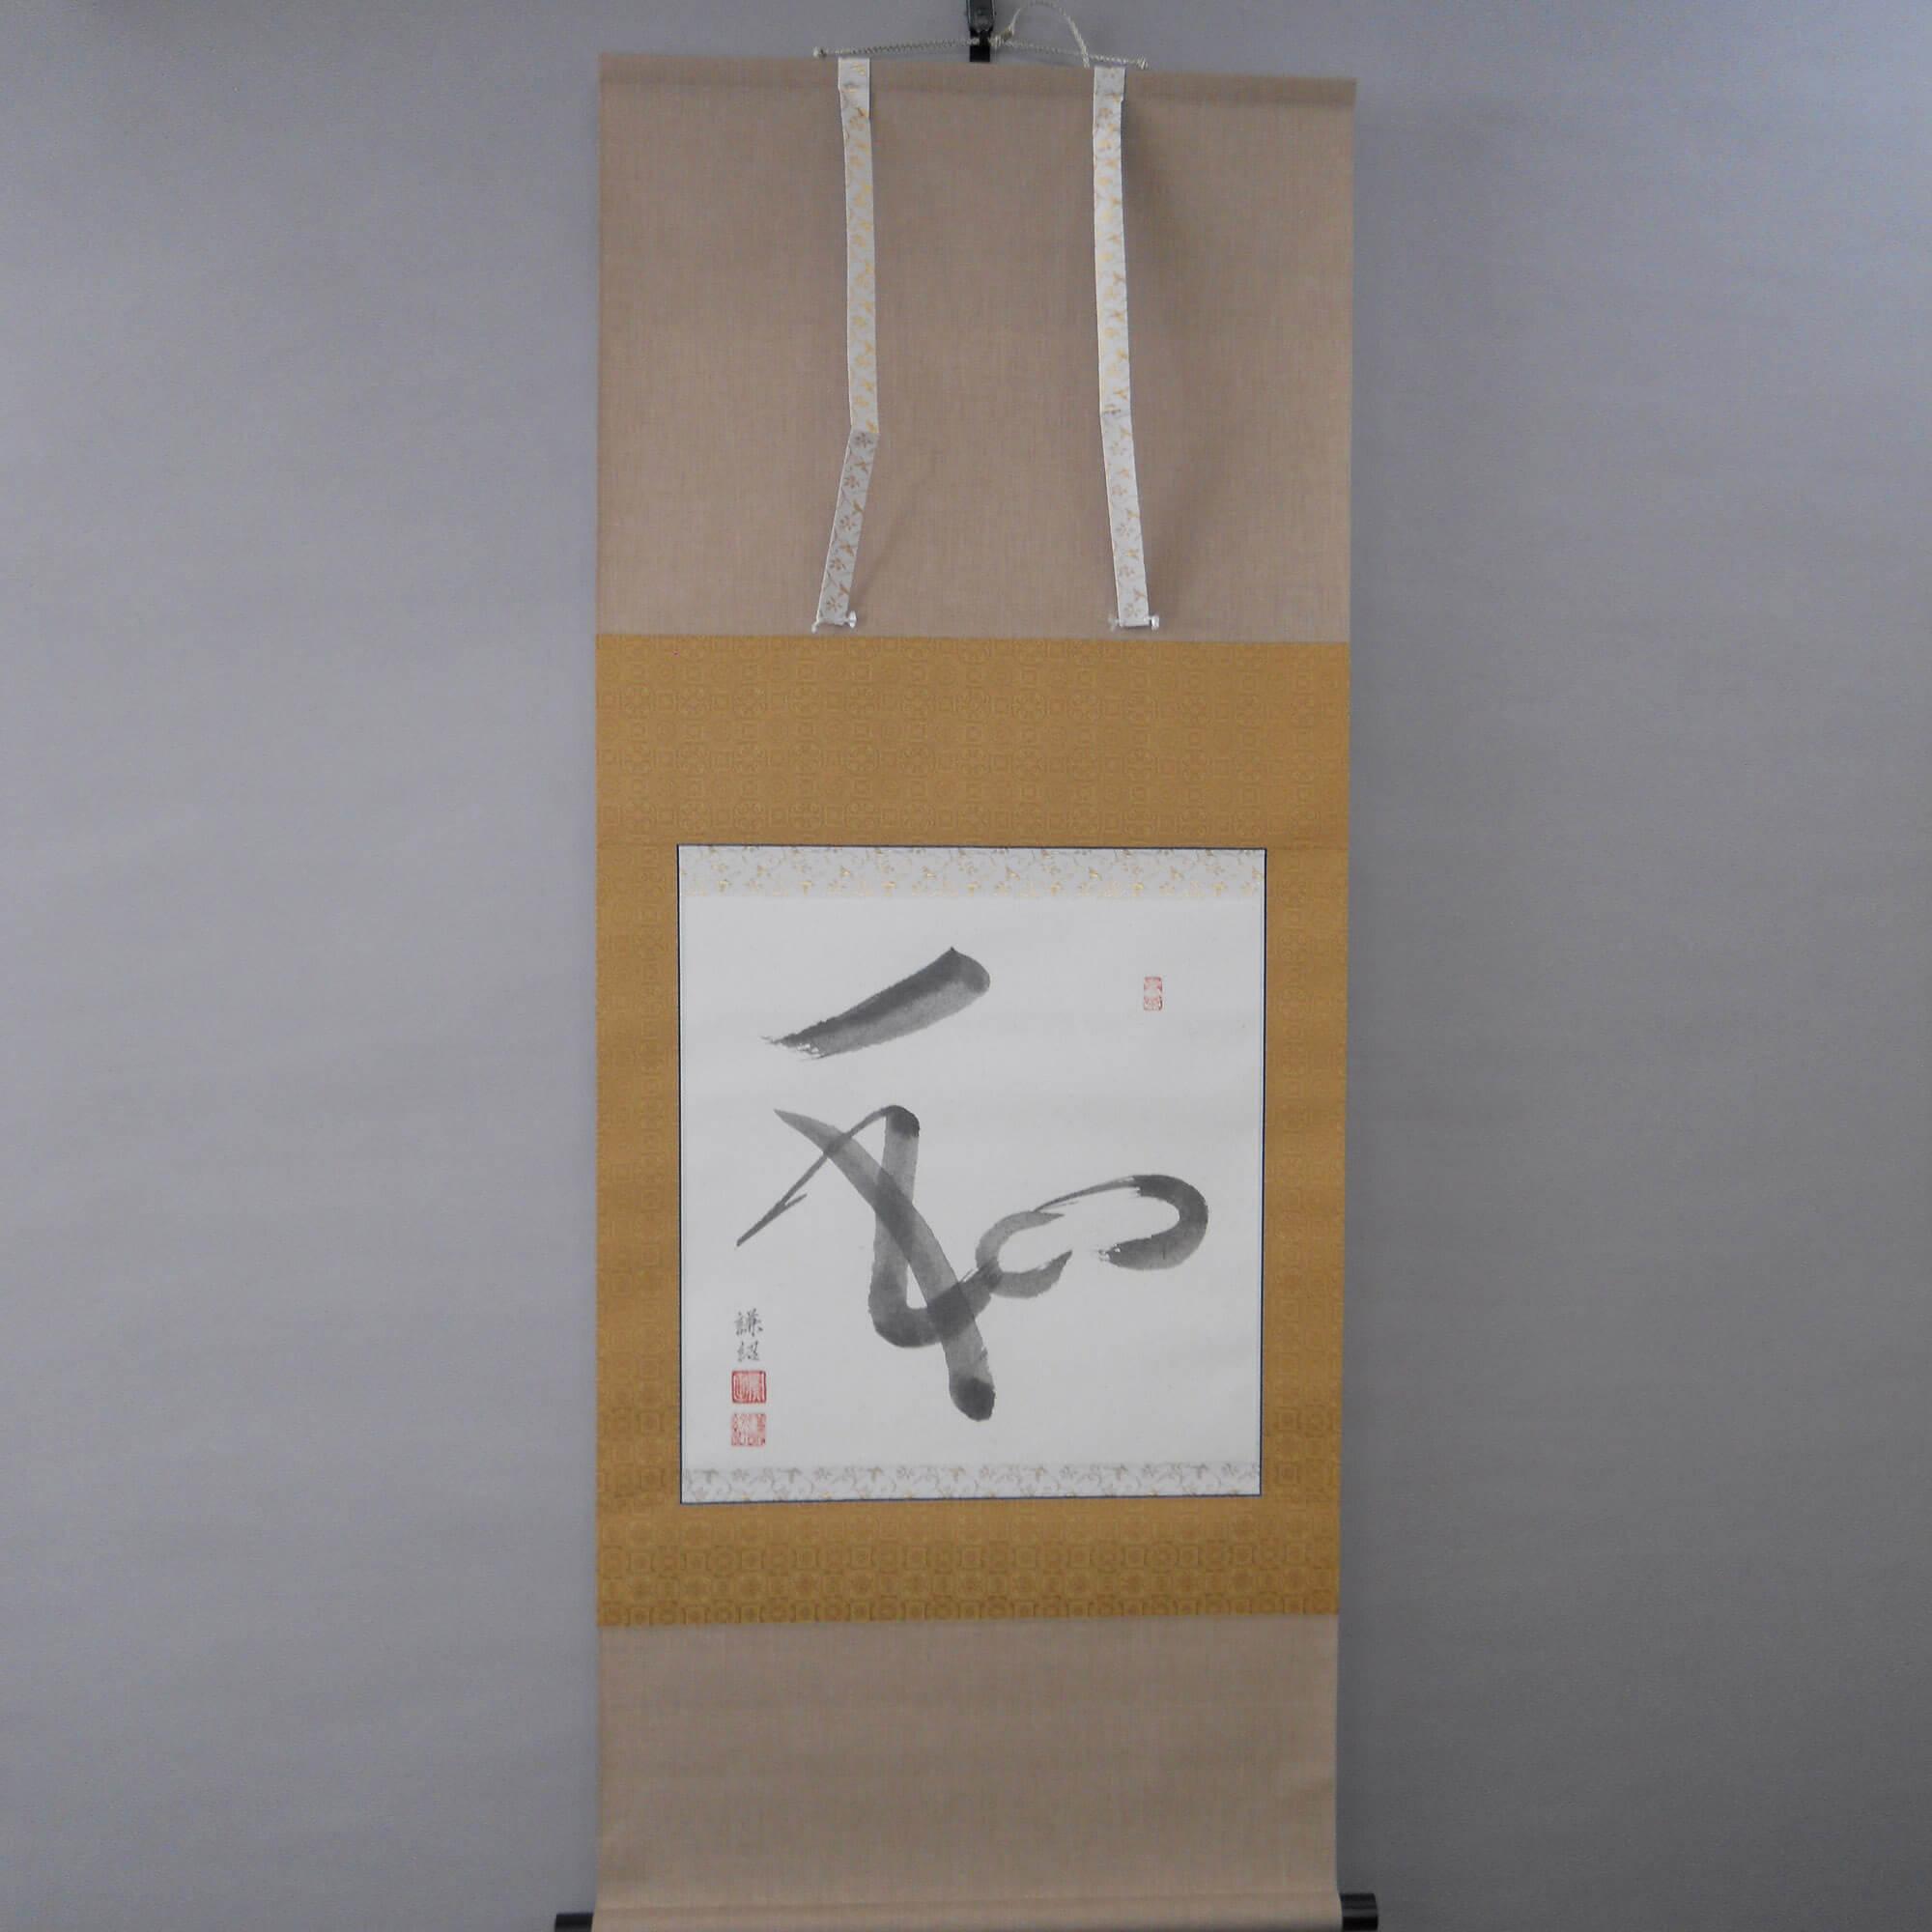 Calligraphy: Wa / Kaida Kenshō